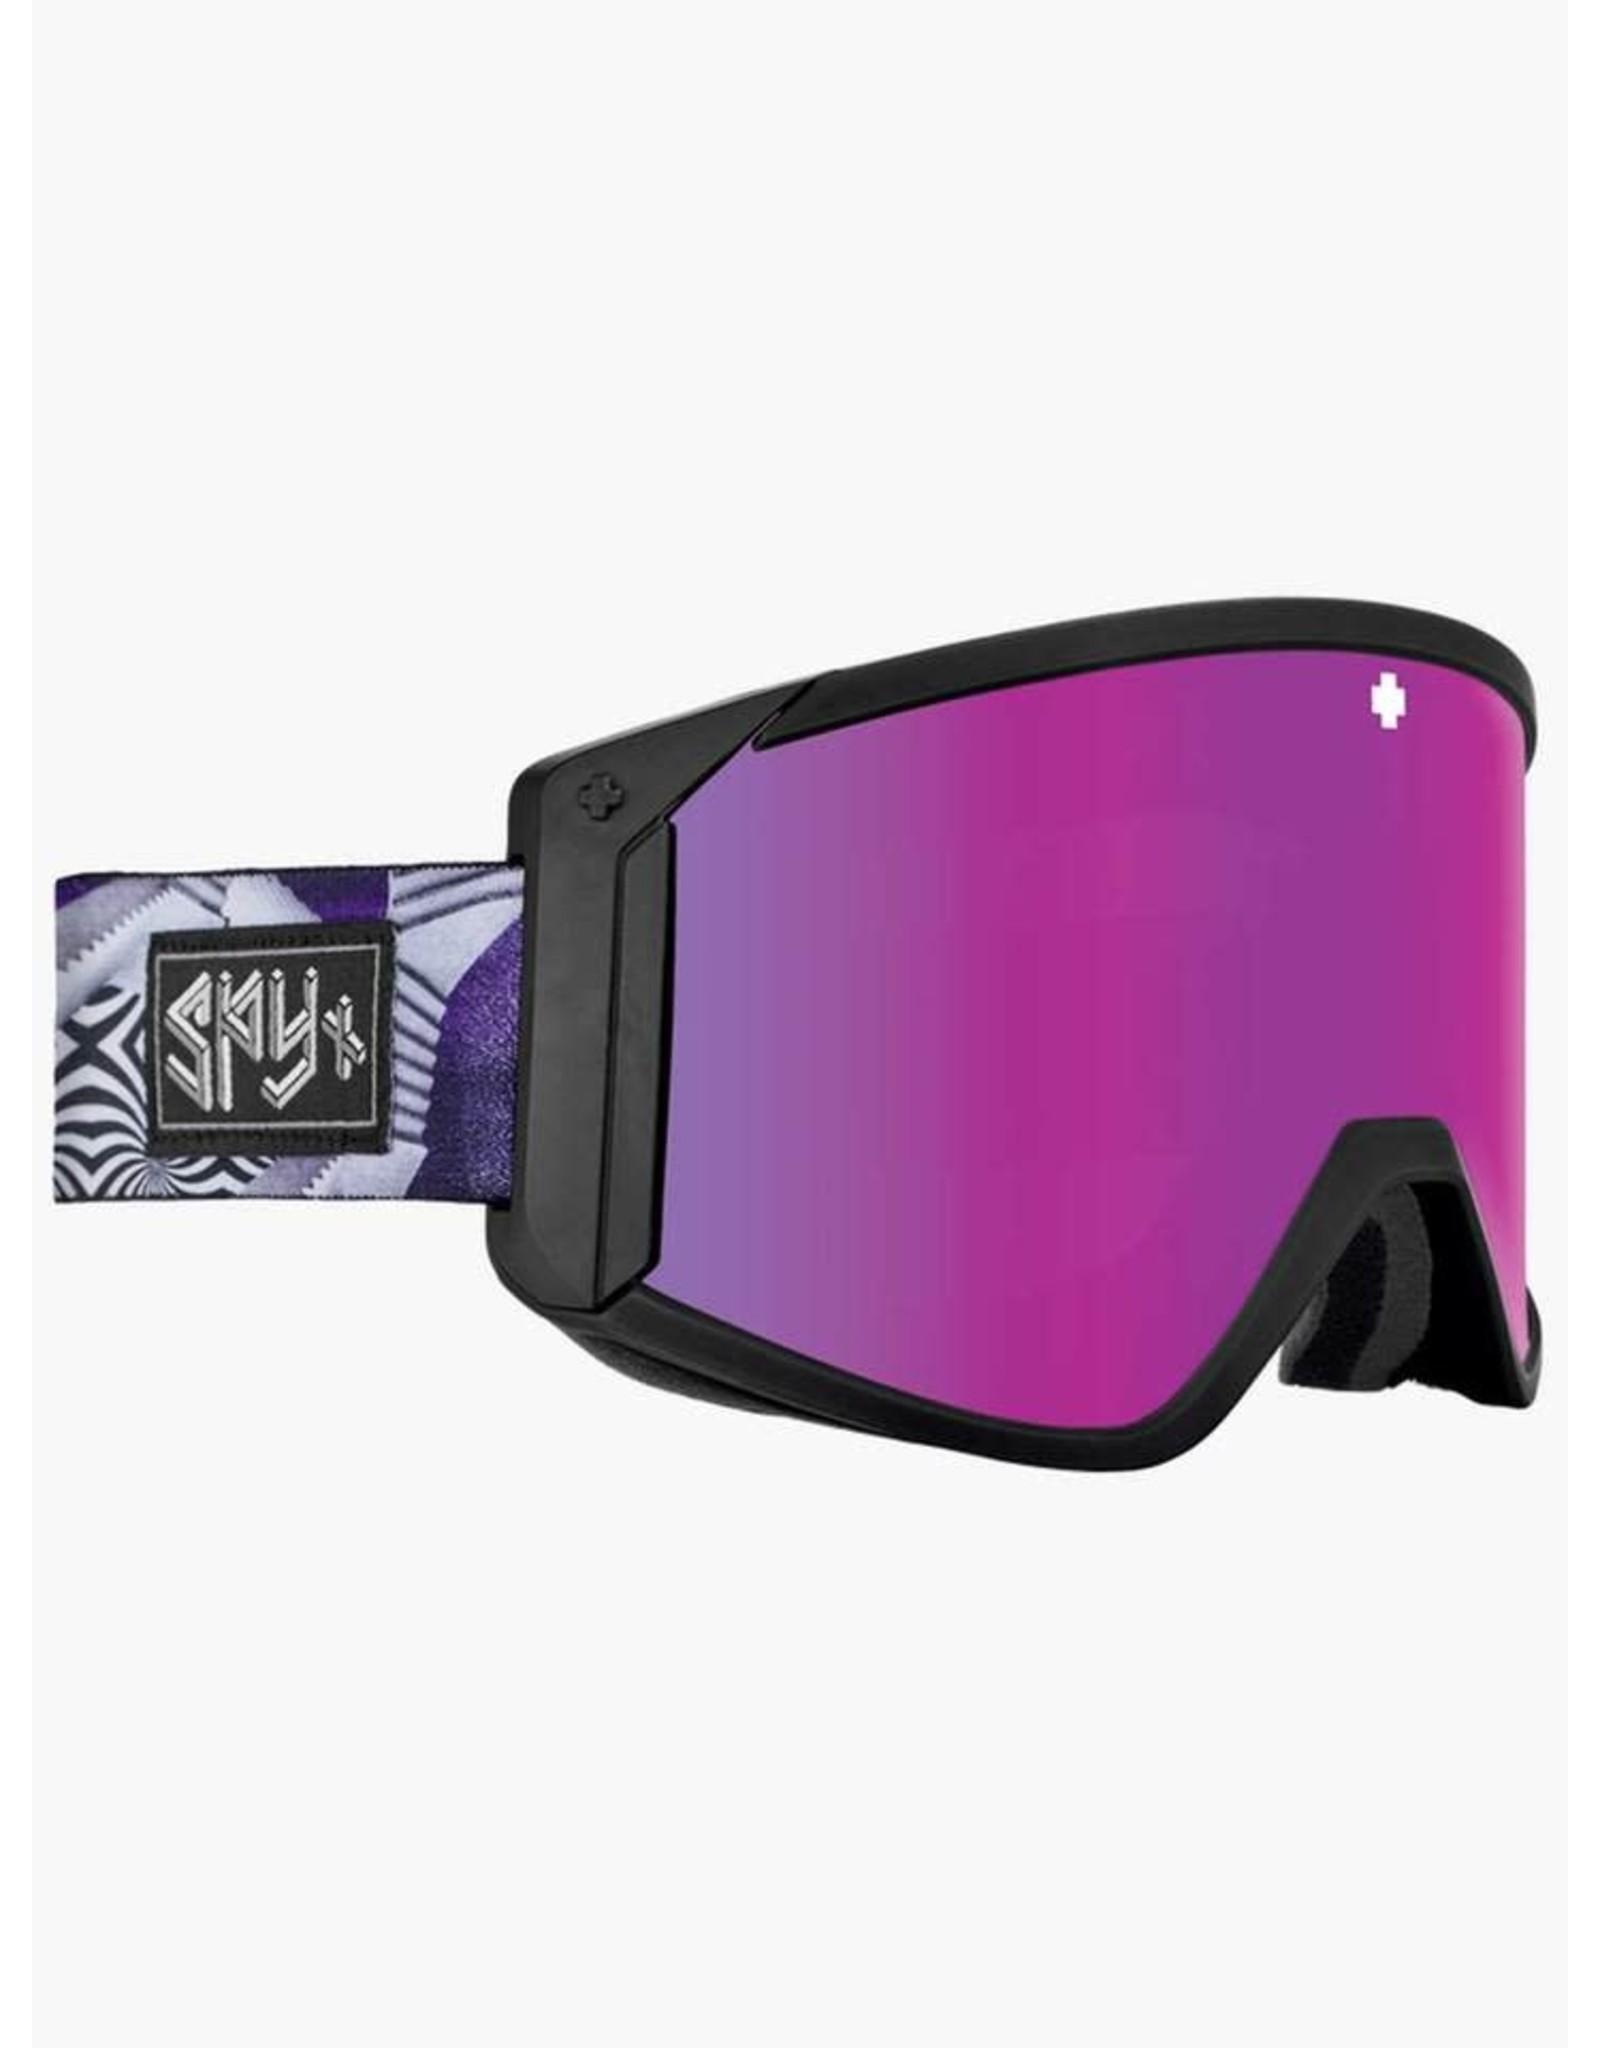 SPY+ Raider Snow Goggle